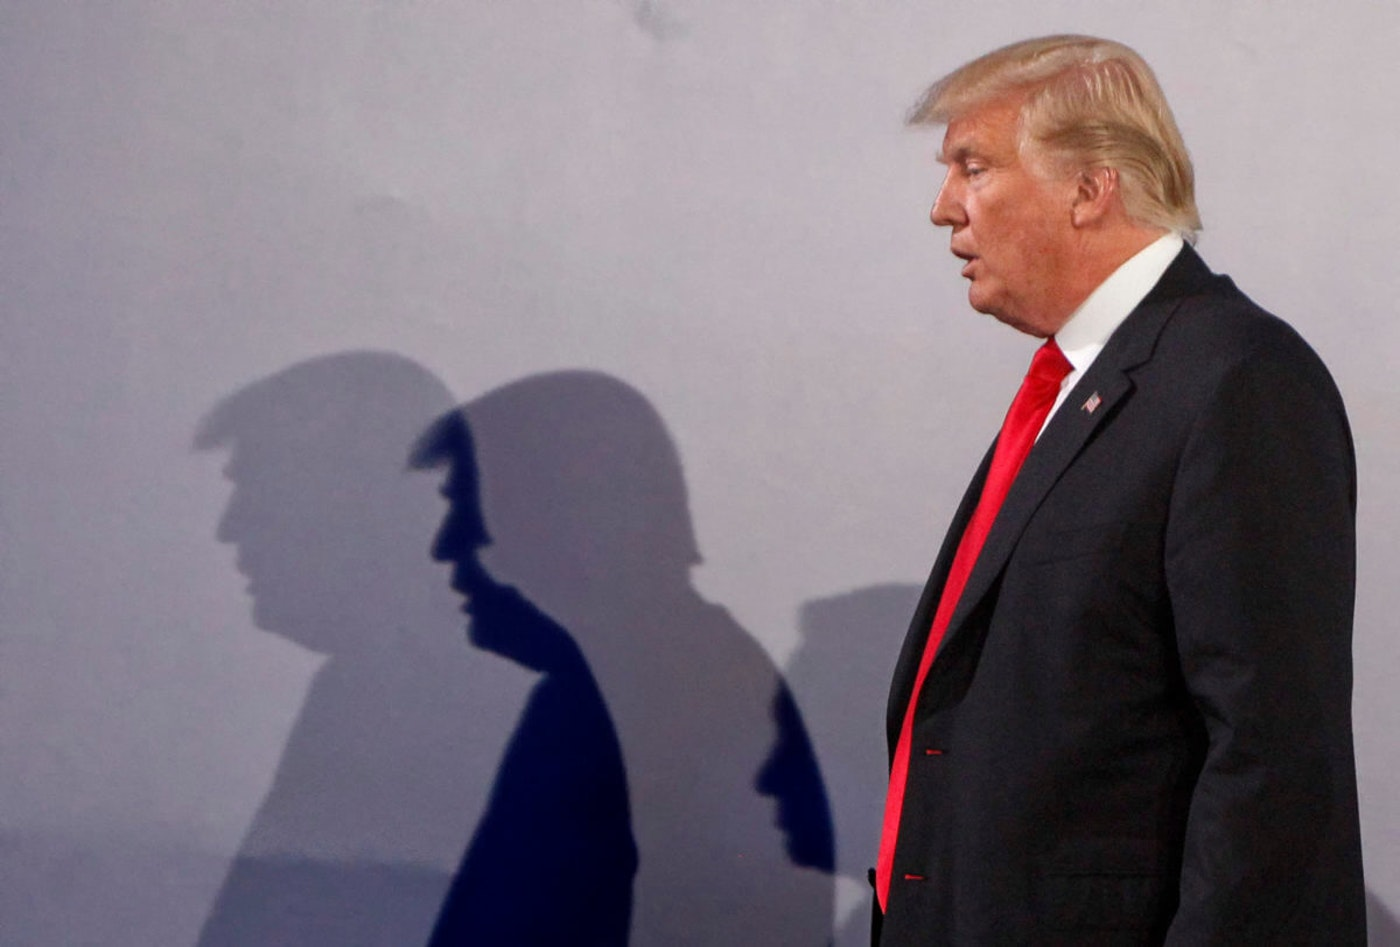 AP Photo/Czarek Sokolowski